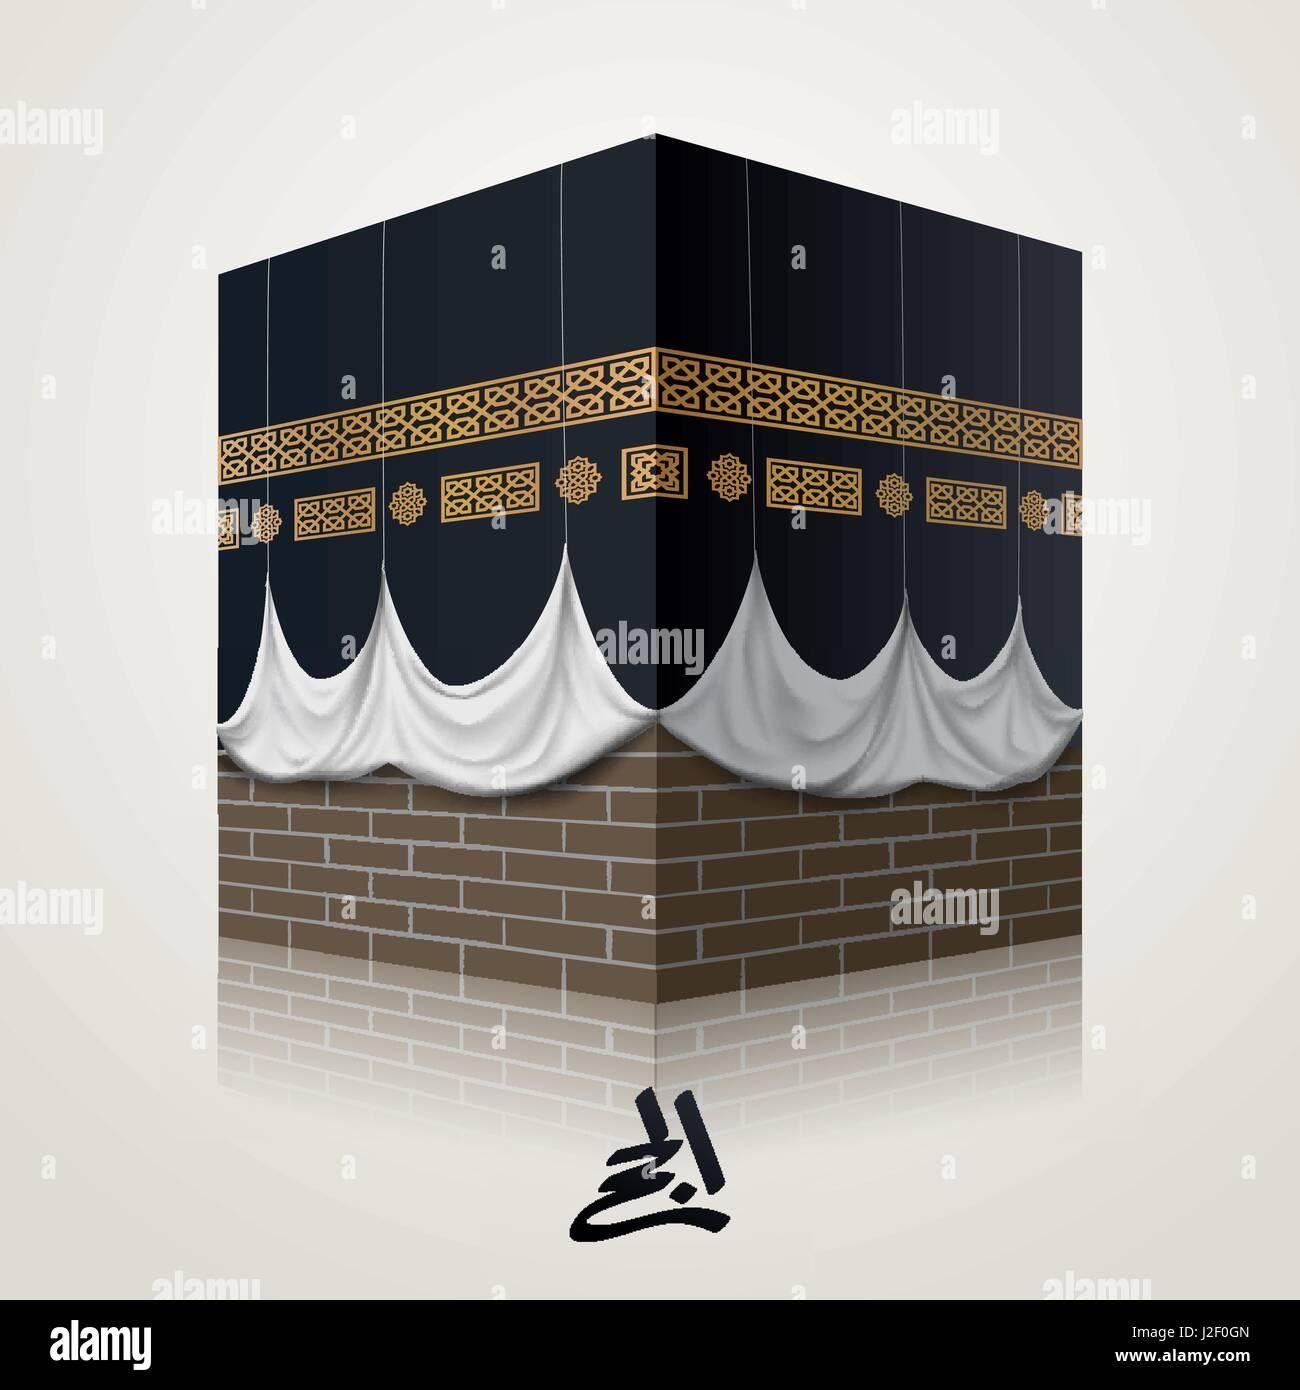 islamic vector realistic icon illustration kaaba for hajj stock vector image art alamy https www alamy com stock photo islamic vector realistic icon illustration kaaba for hajj pilgrimage 139242005 html